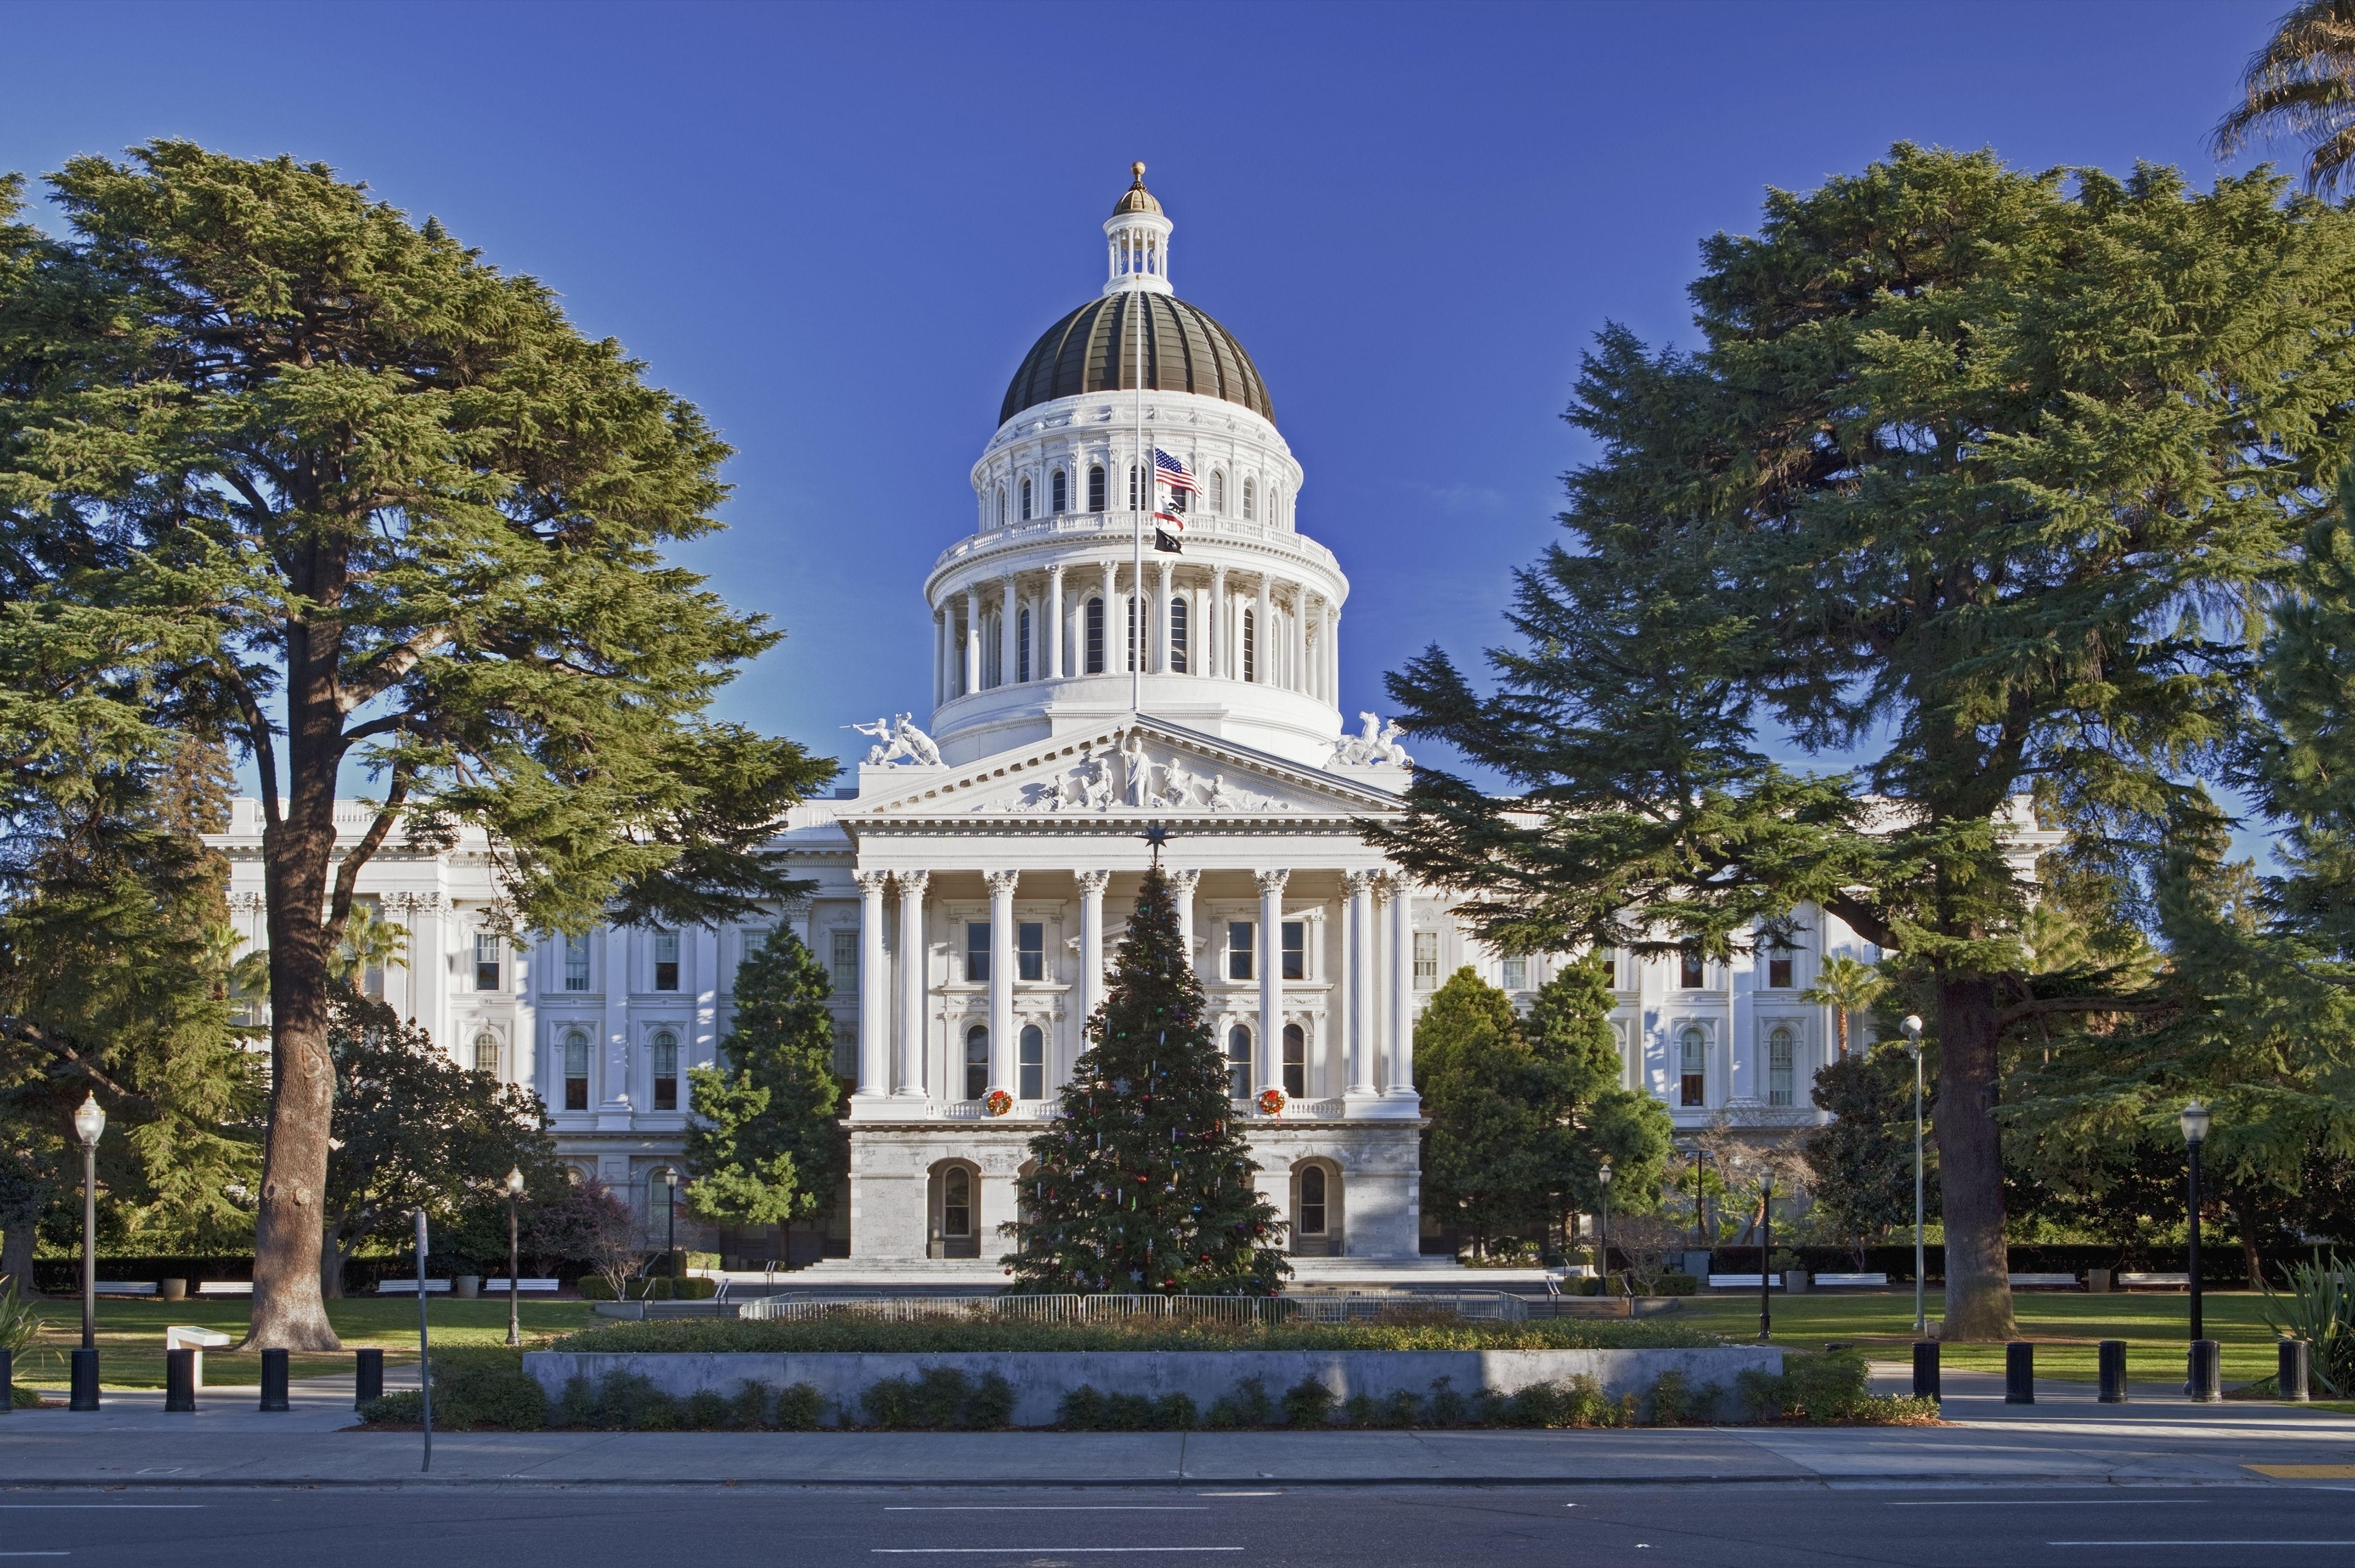 Budget Car Rental Sacramento: How To Get Help From The IRS In Sacramento